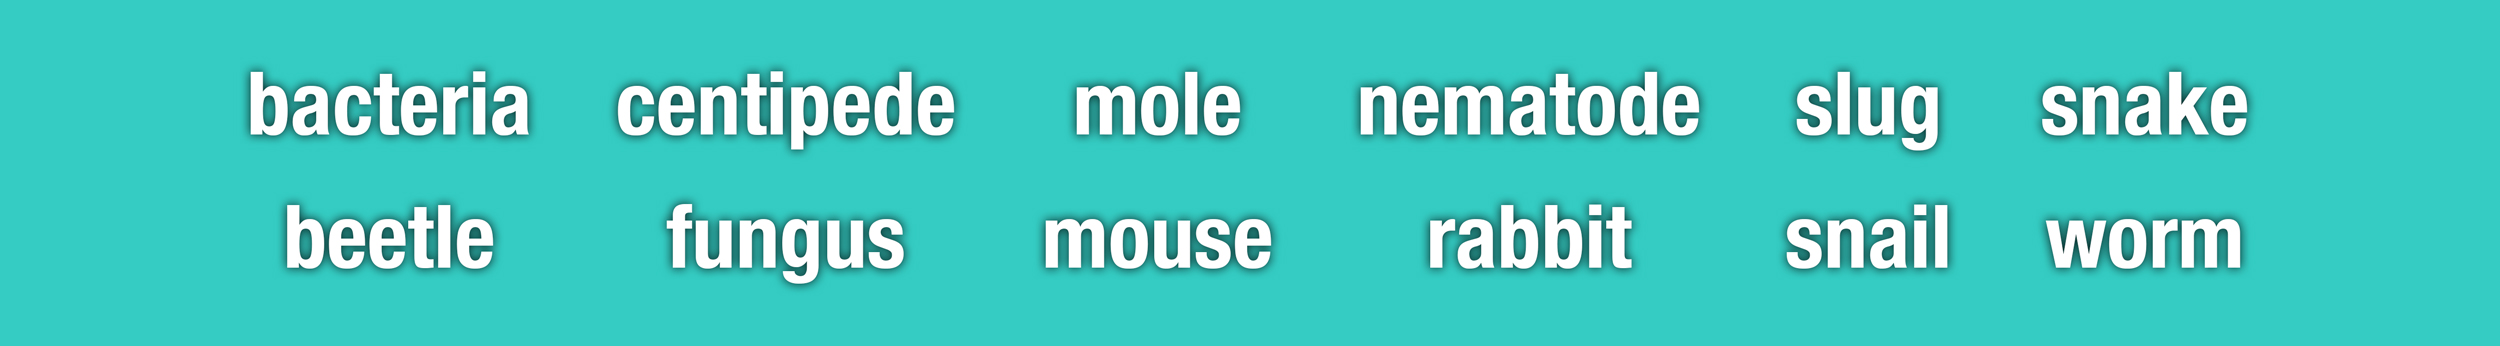 bacteria beetle centipede fungus mole mouse nematode rabbit slug snail snake worm